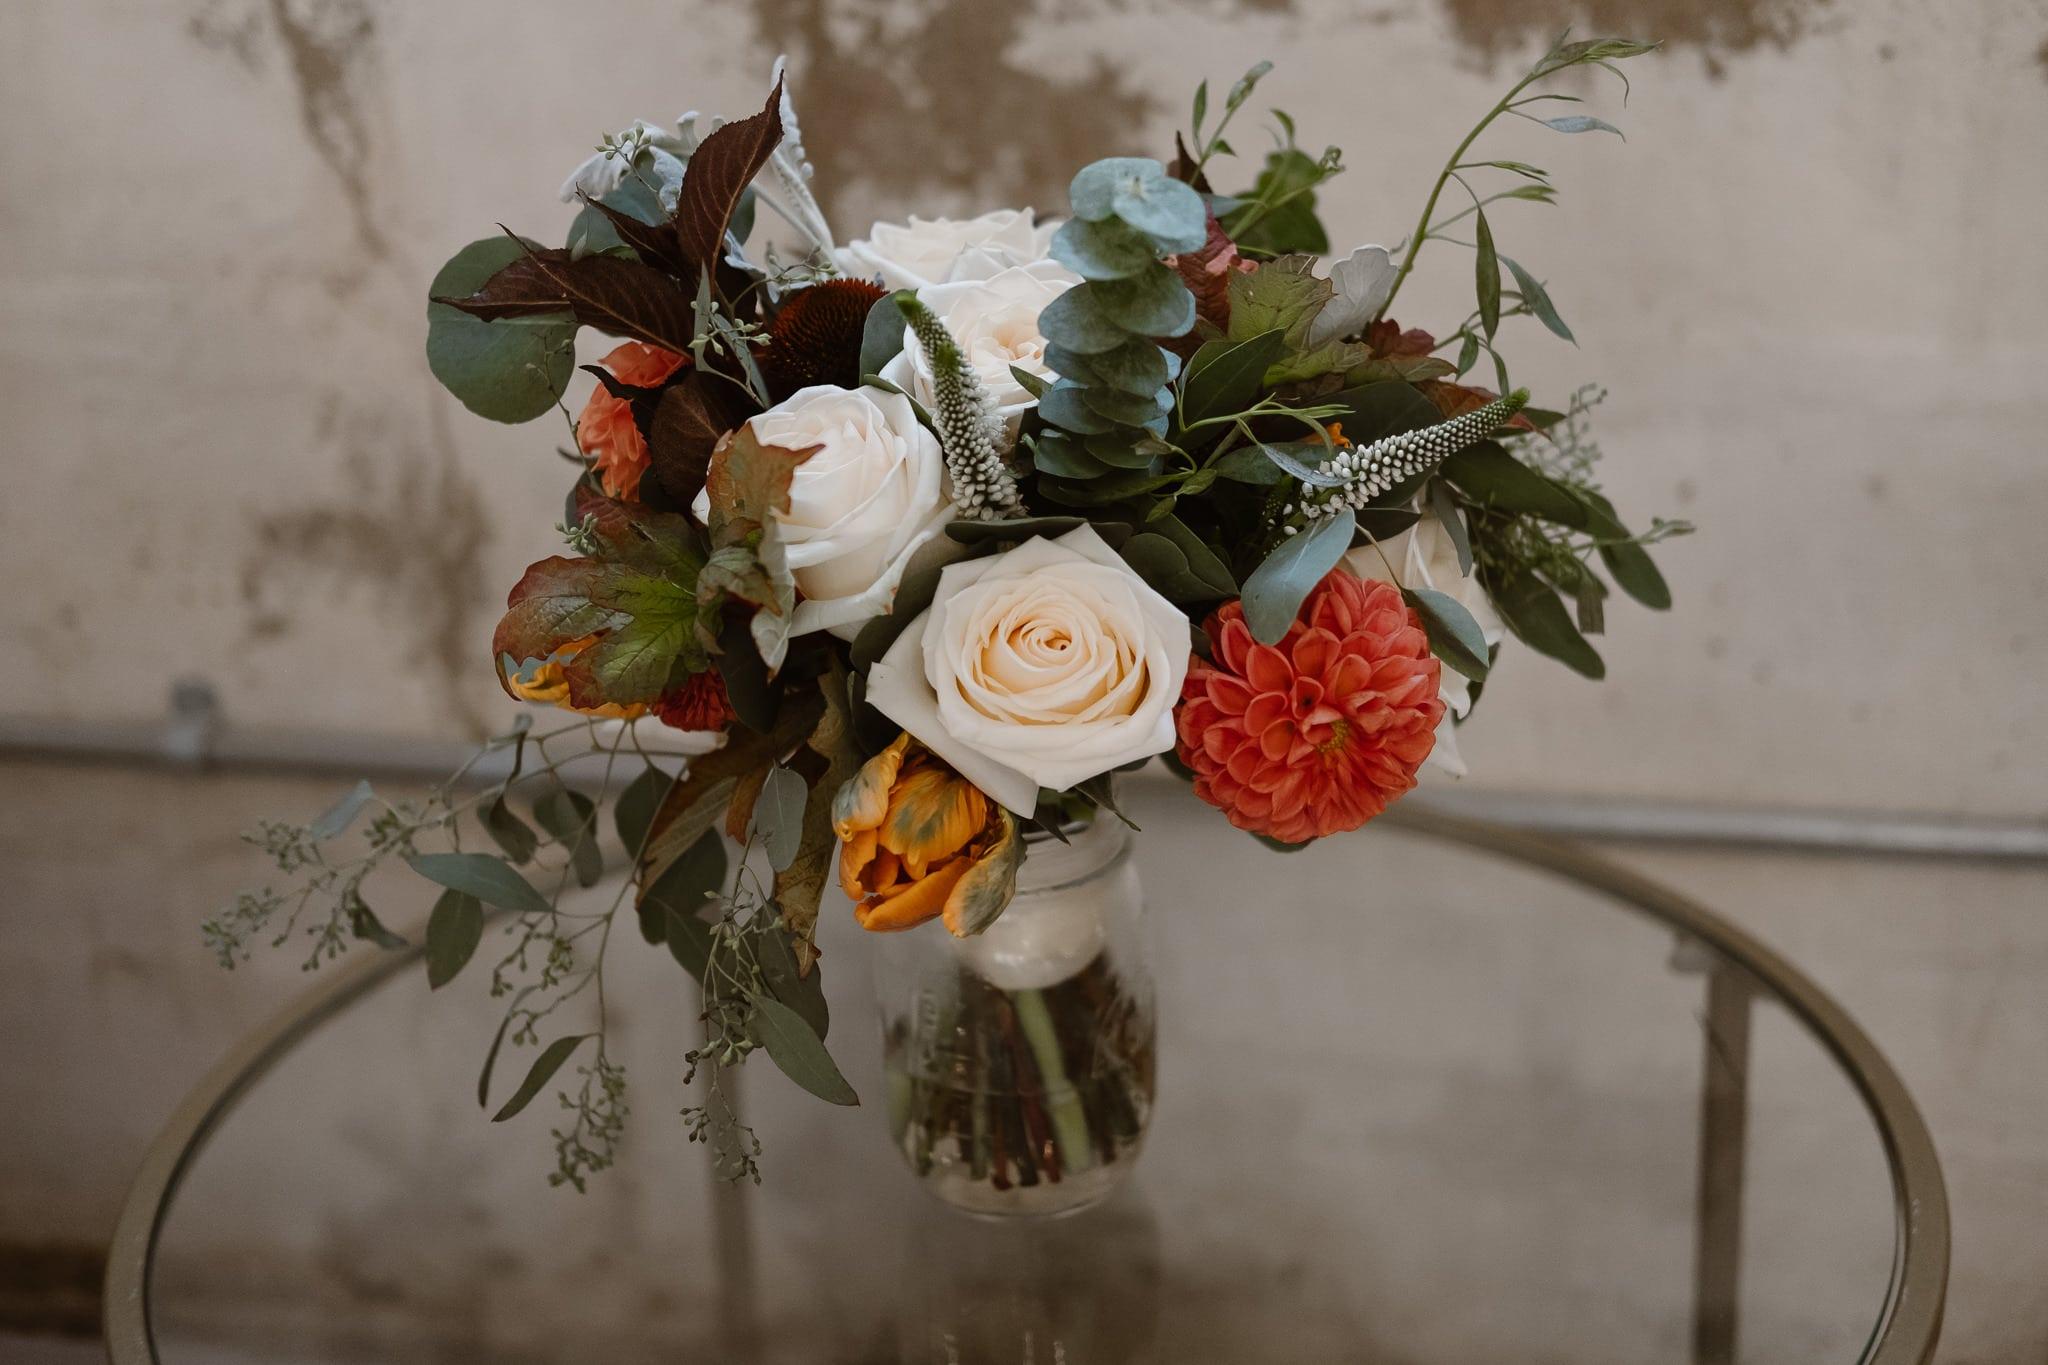 St Vrain Wedding Photographer   Longmont Wedding Photographer   Colorado Winter Wedding Photographer, Colorado industrial chic wedding, bride's bouquet